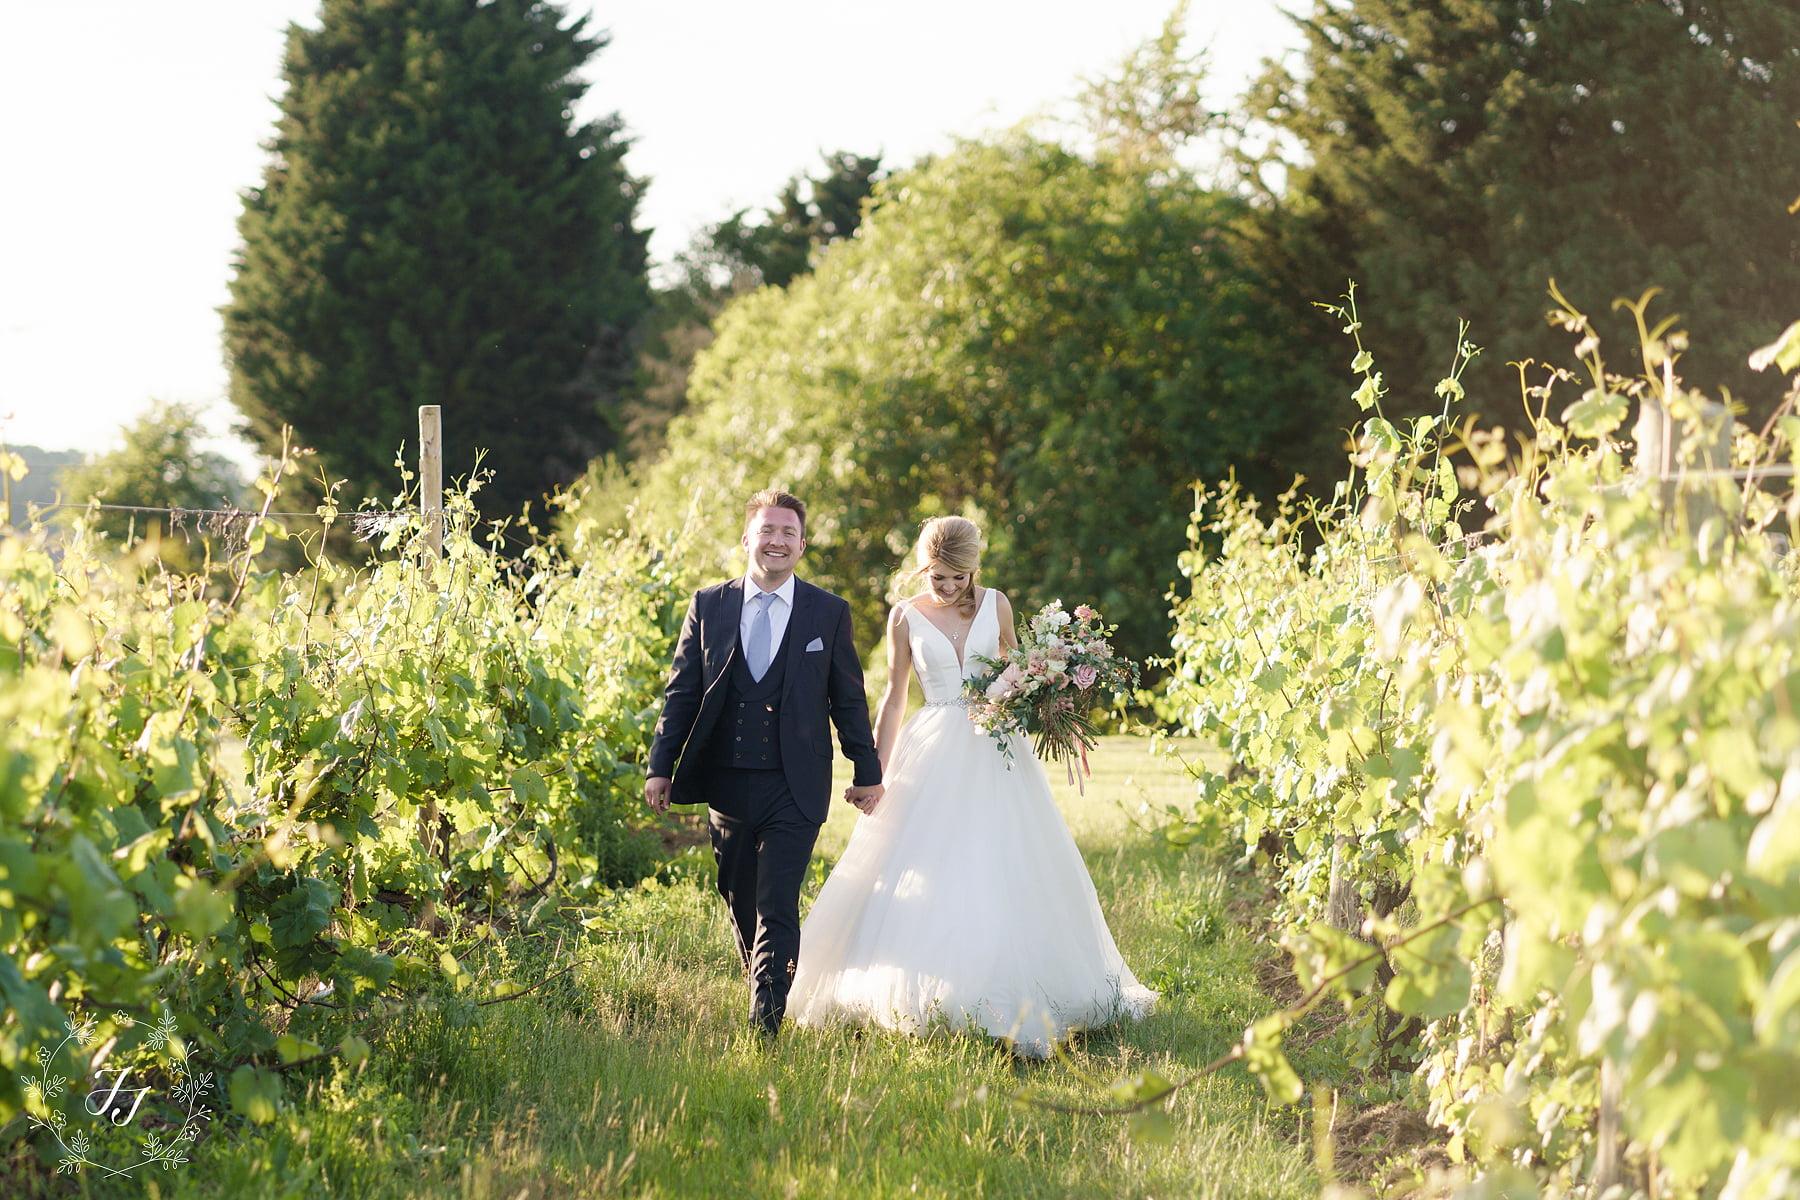 wedding photography at Newhall vineyard, bride and groom walk through the vineyard